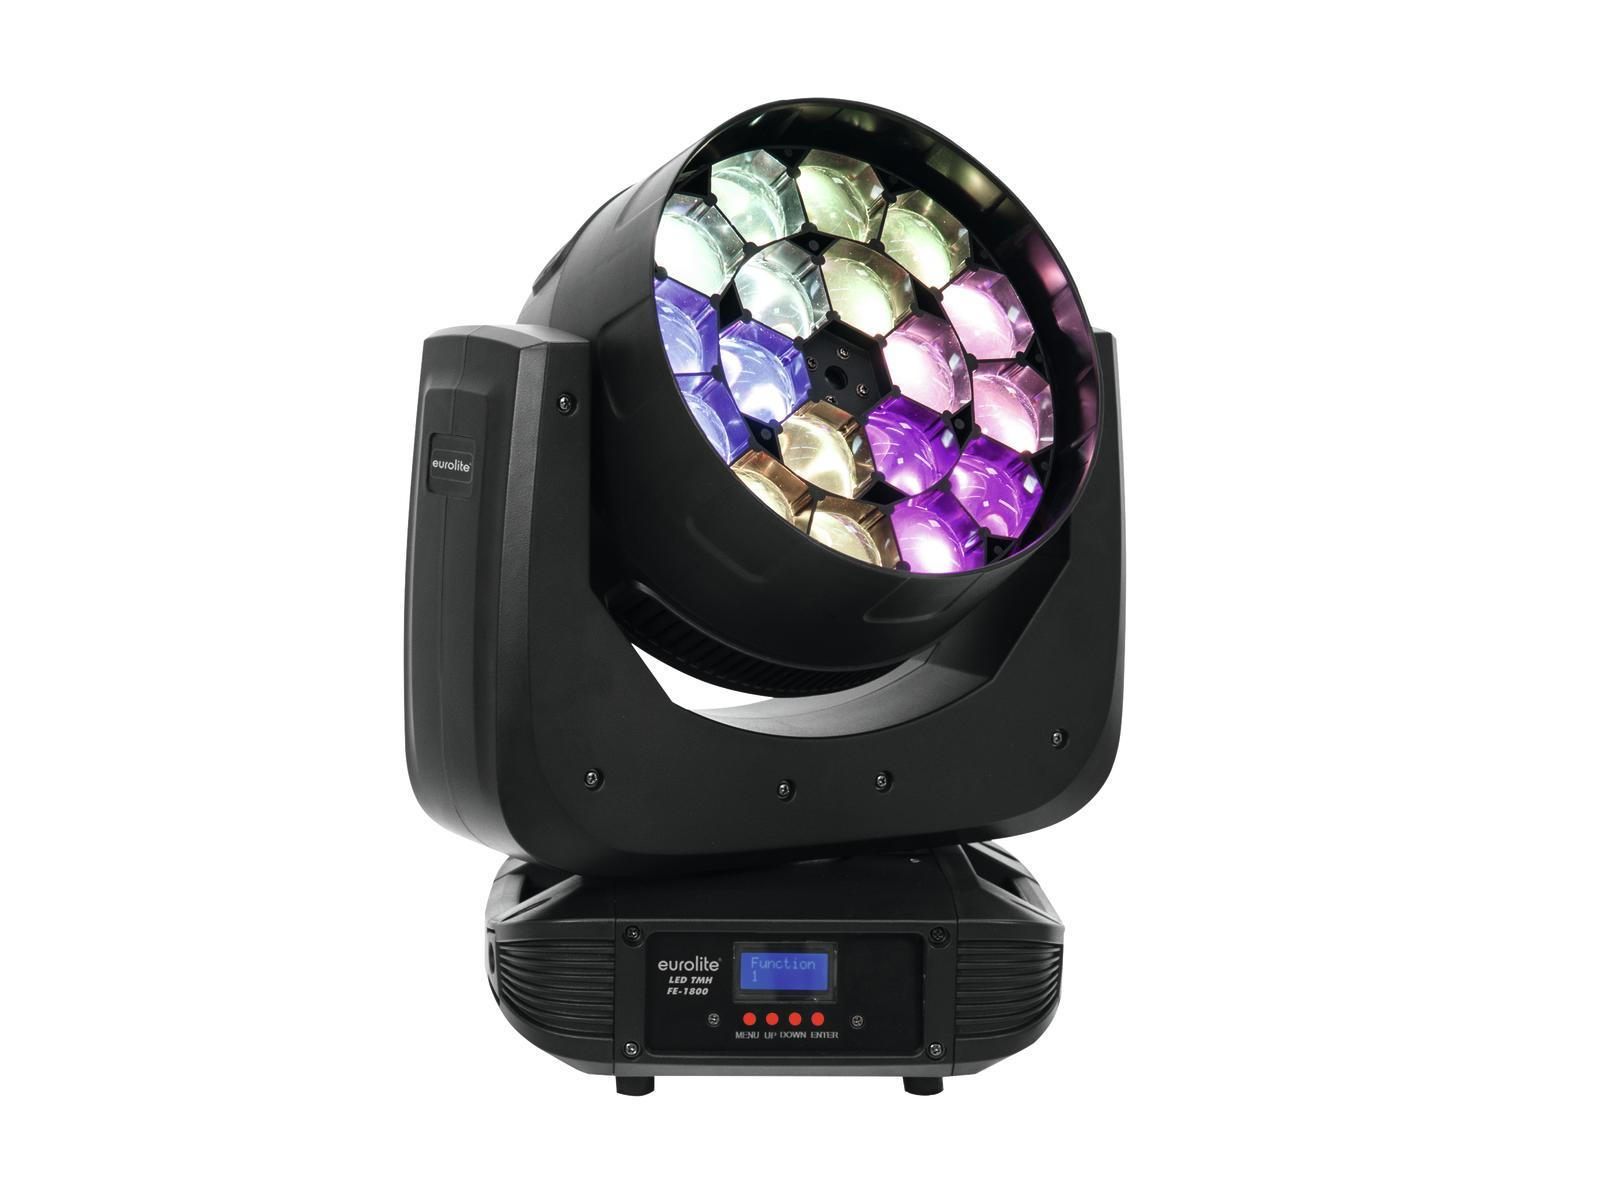 Effetto luce Light testa mobile BEAM Moving Head DMX 512 Eurolite TMH FE-1800